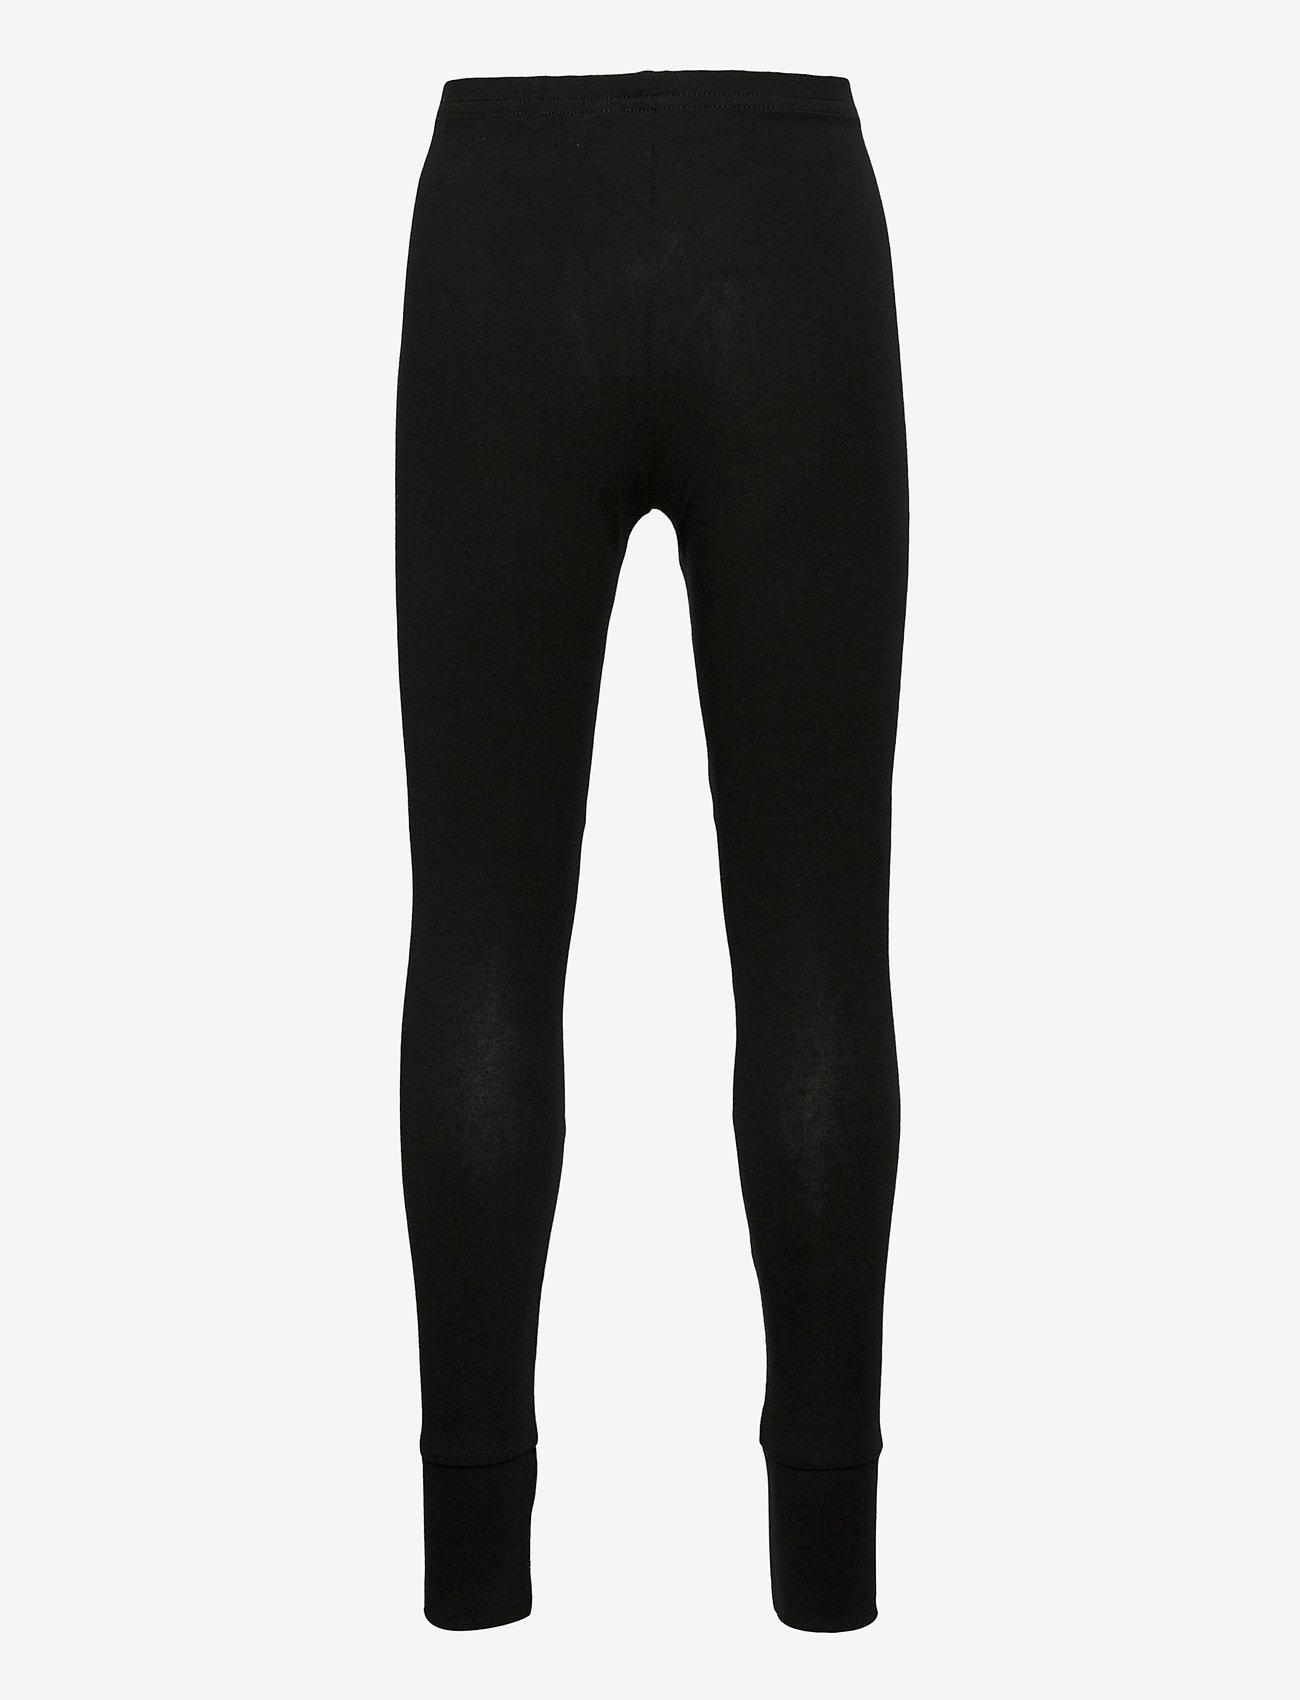 Papu - PATCH LEGGINGS KID - leggings - black, stone grey - 1